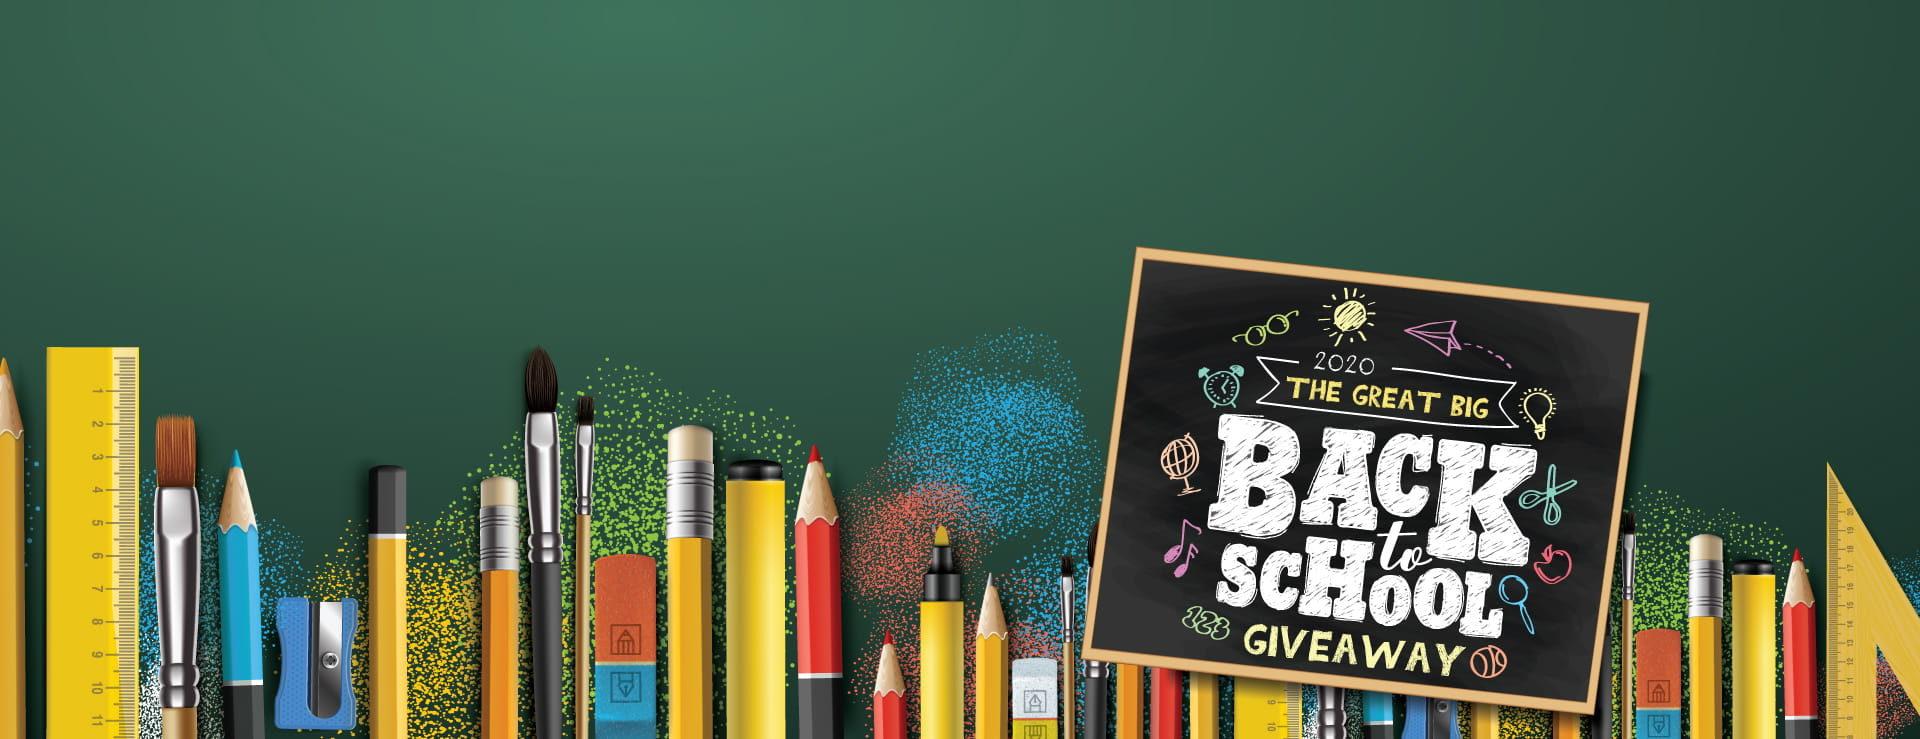 b2s-giveaway-web-7-final-min